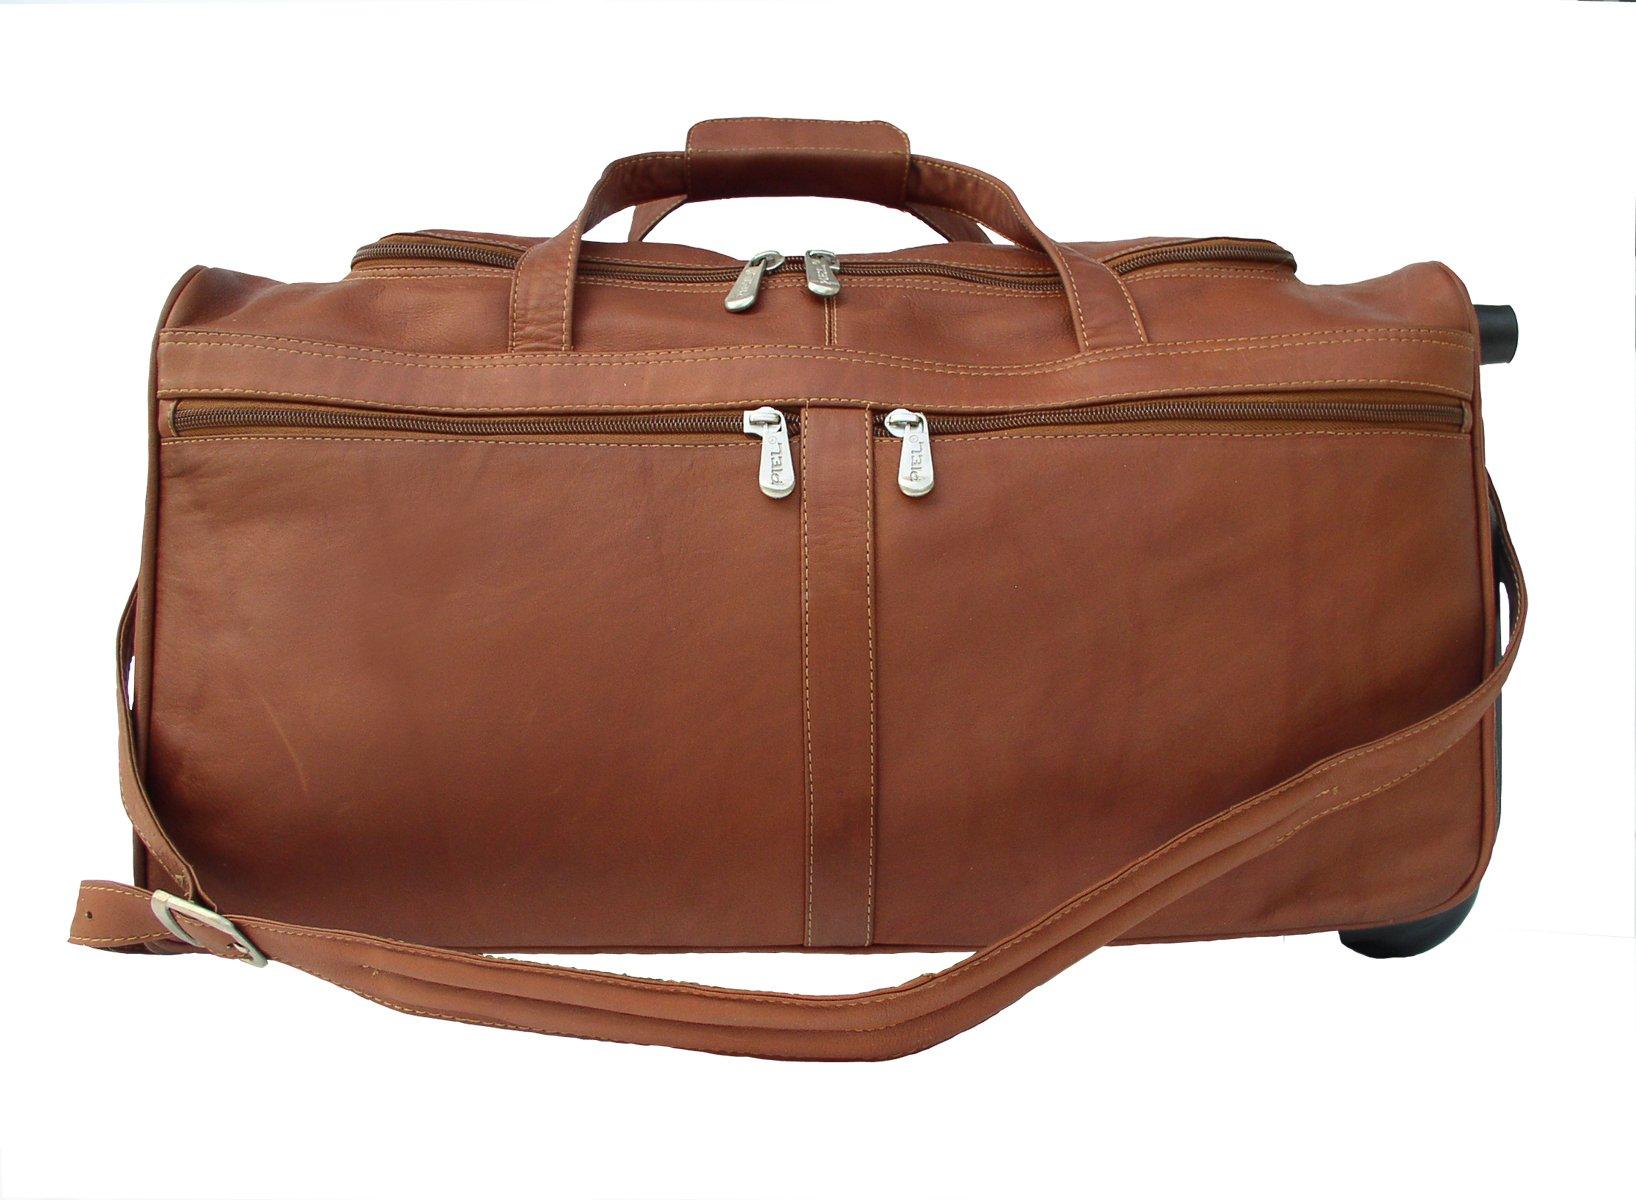 Piel Leather Traveler Duffel Bag on Wheels in Saddle